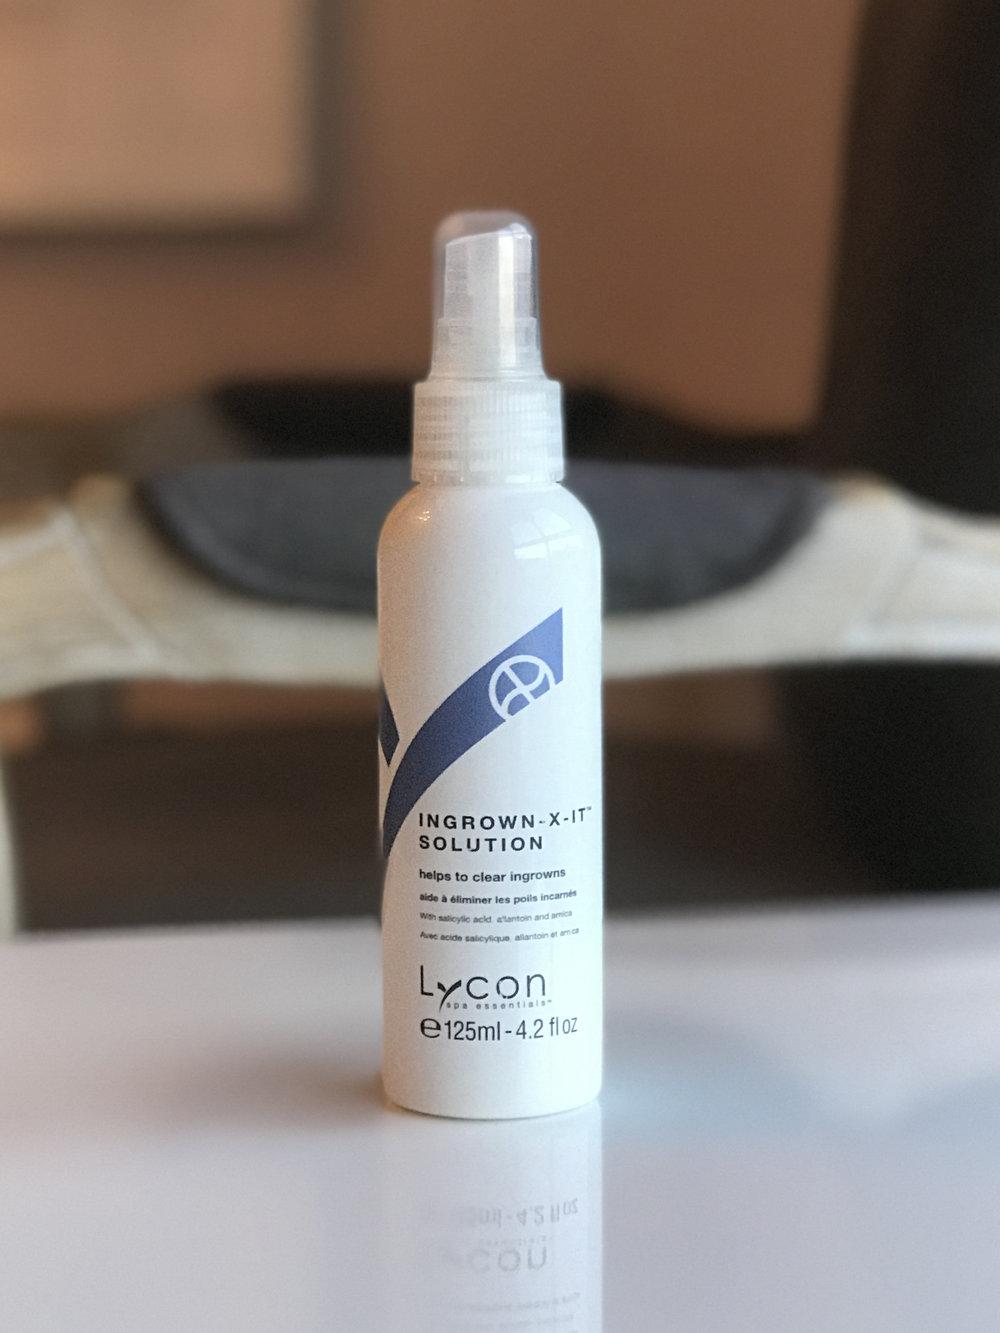 Lycon Ingrown X-It Solution